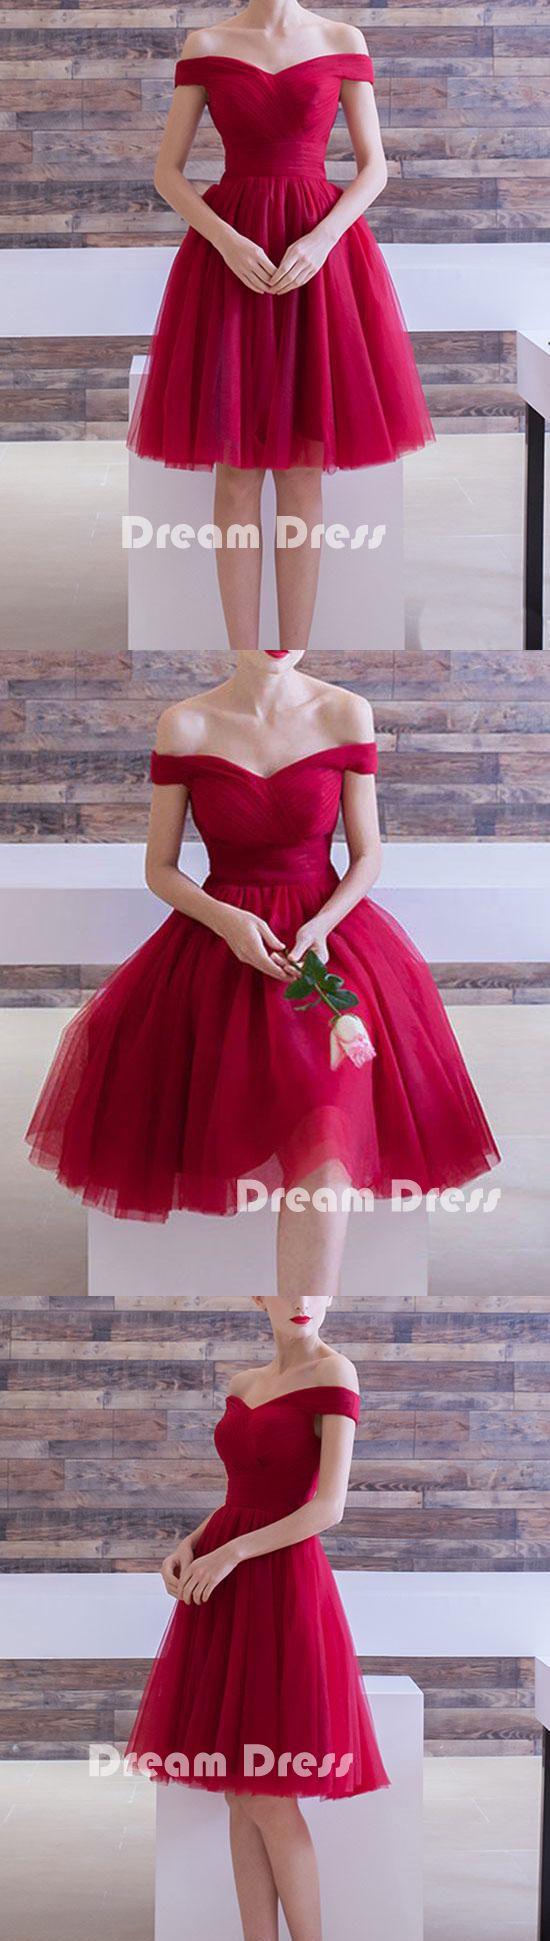 Off shoulder short prom dress, Cheap homecoming dresses,PD210004 #promdress #fashion #shopping #dresses #evening